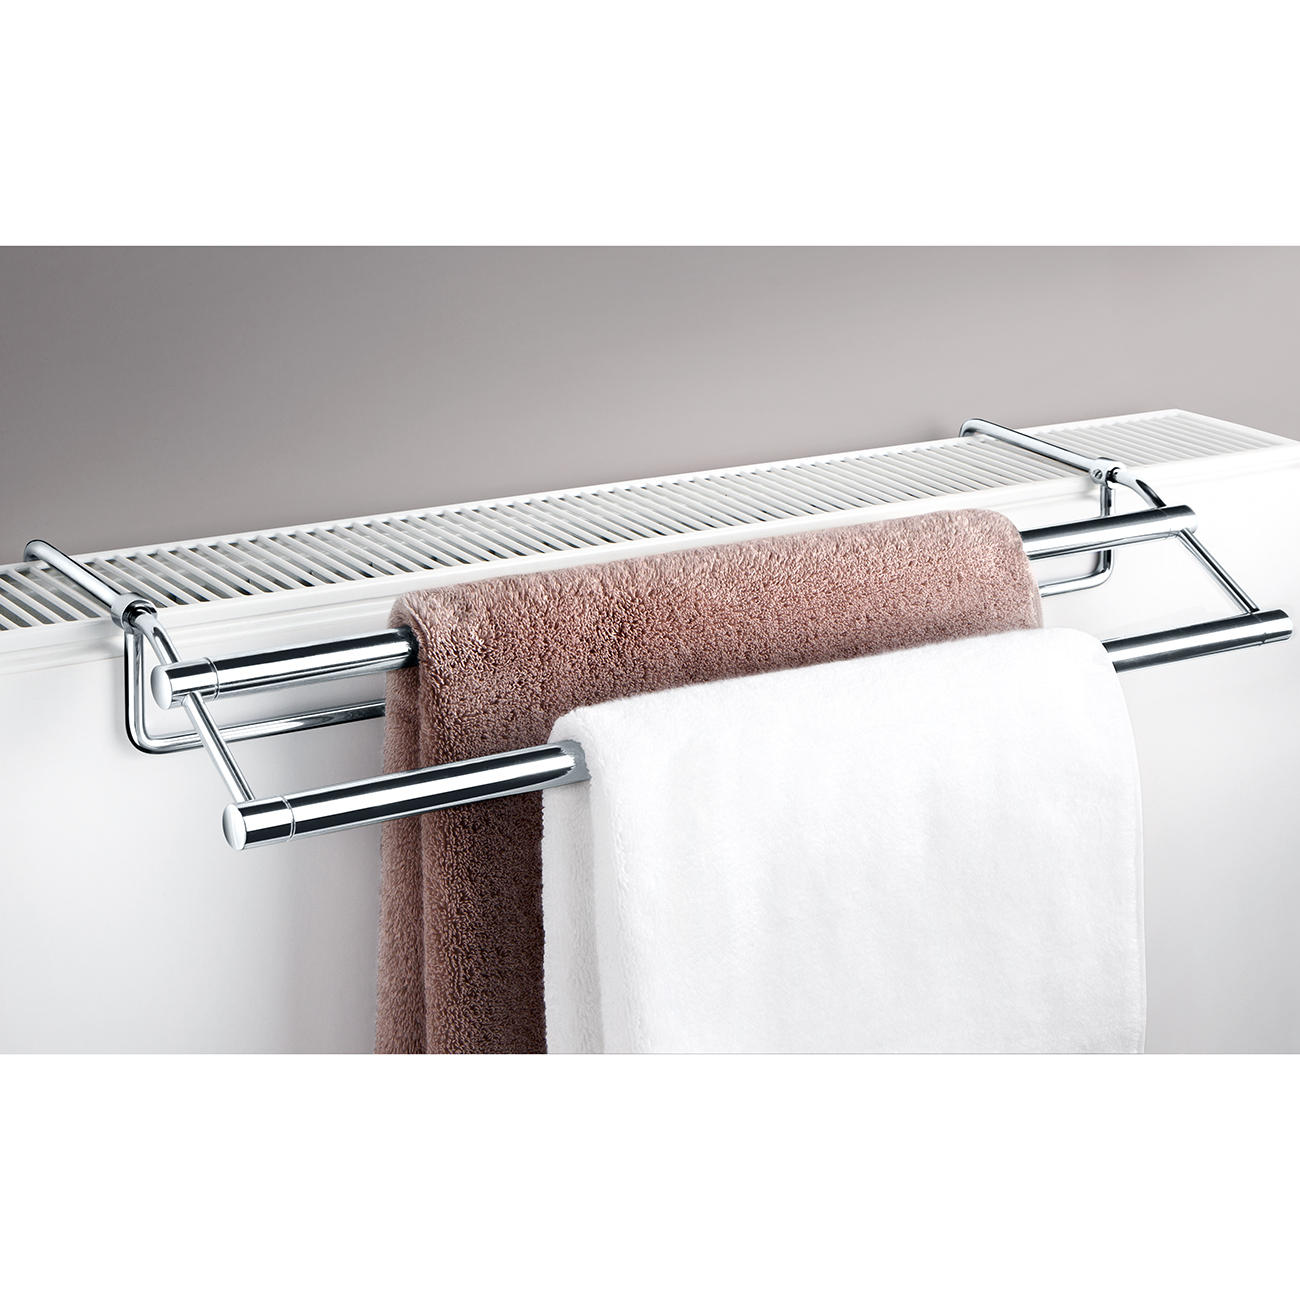 Buy Radiator Towel Rail 3 Year Product Guarantee